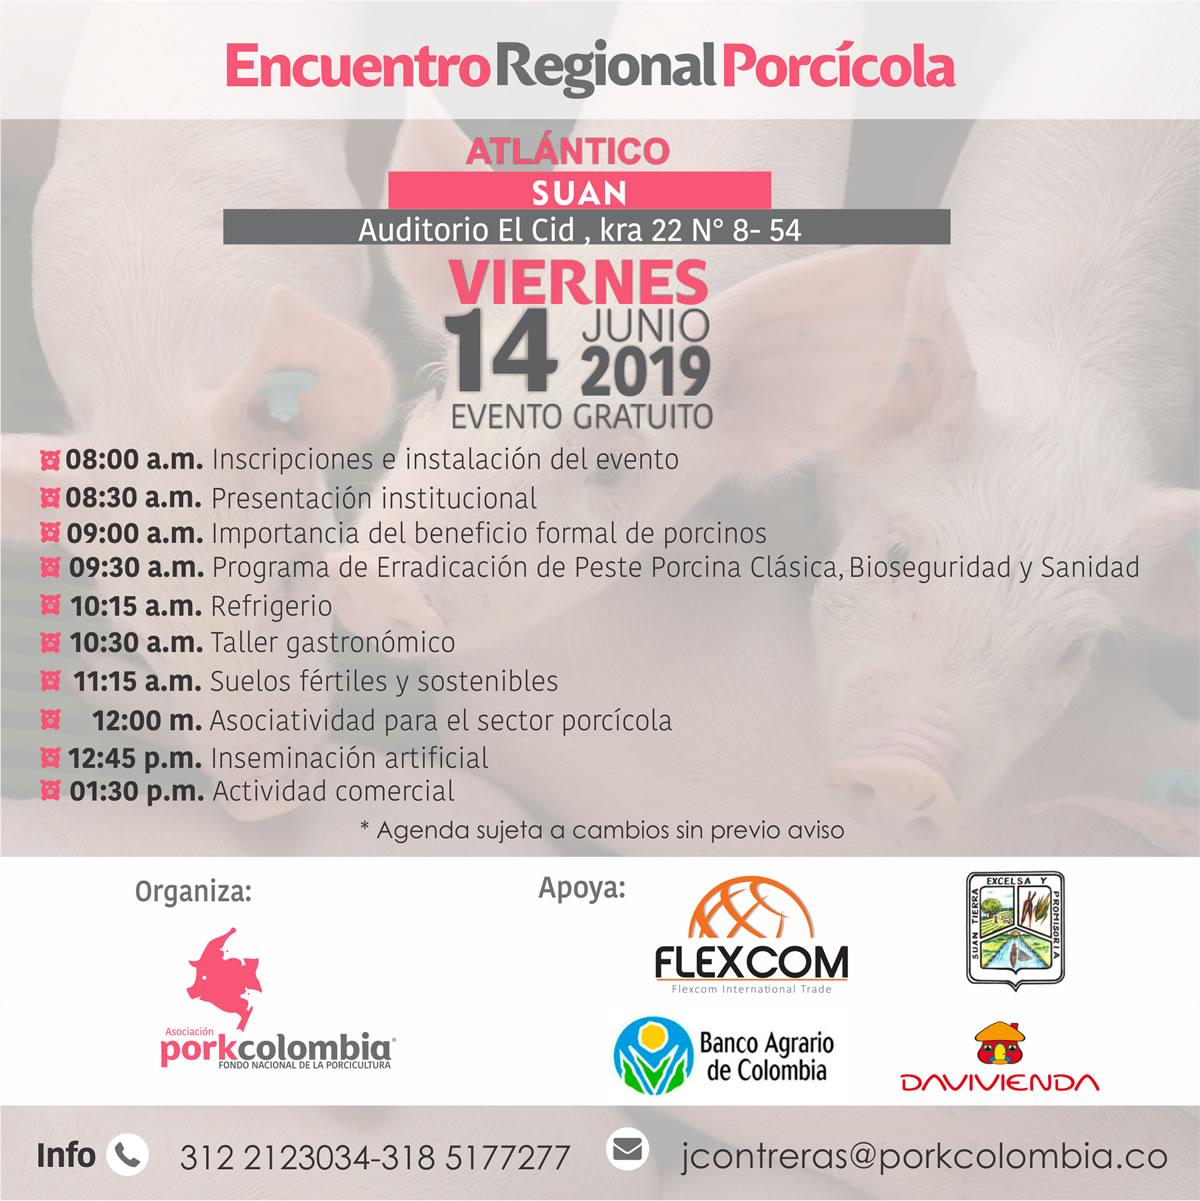 https://www.porkcolombia.co/wp-content/uploads/2019/06/Agenda_14dejunio-suan.jpg